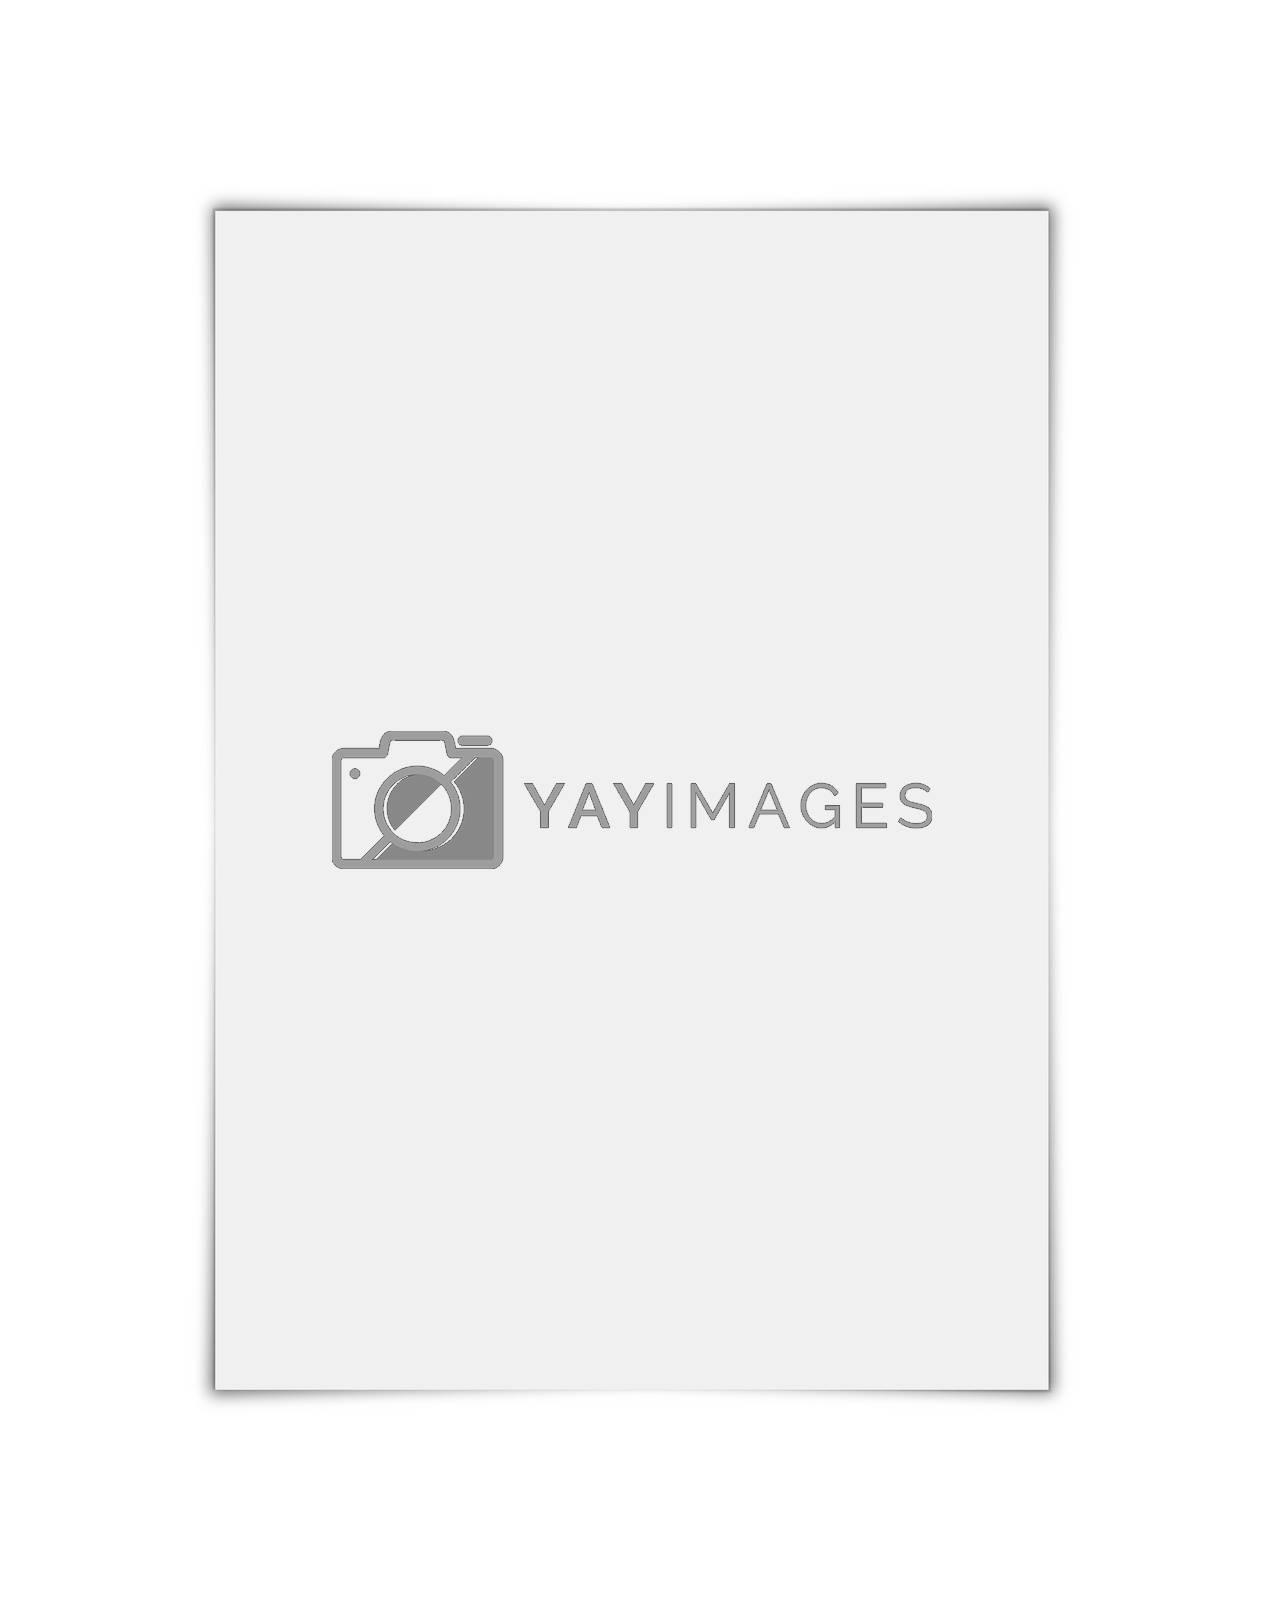 Layout blank sheet of paper in A4 format. Blank sheet of paper.